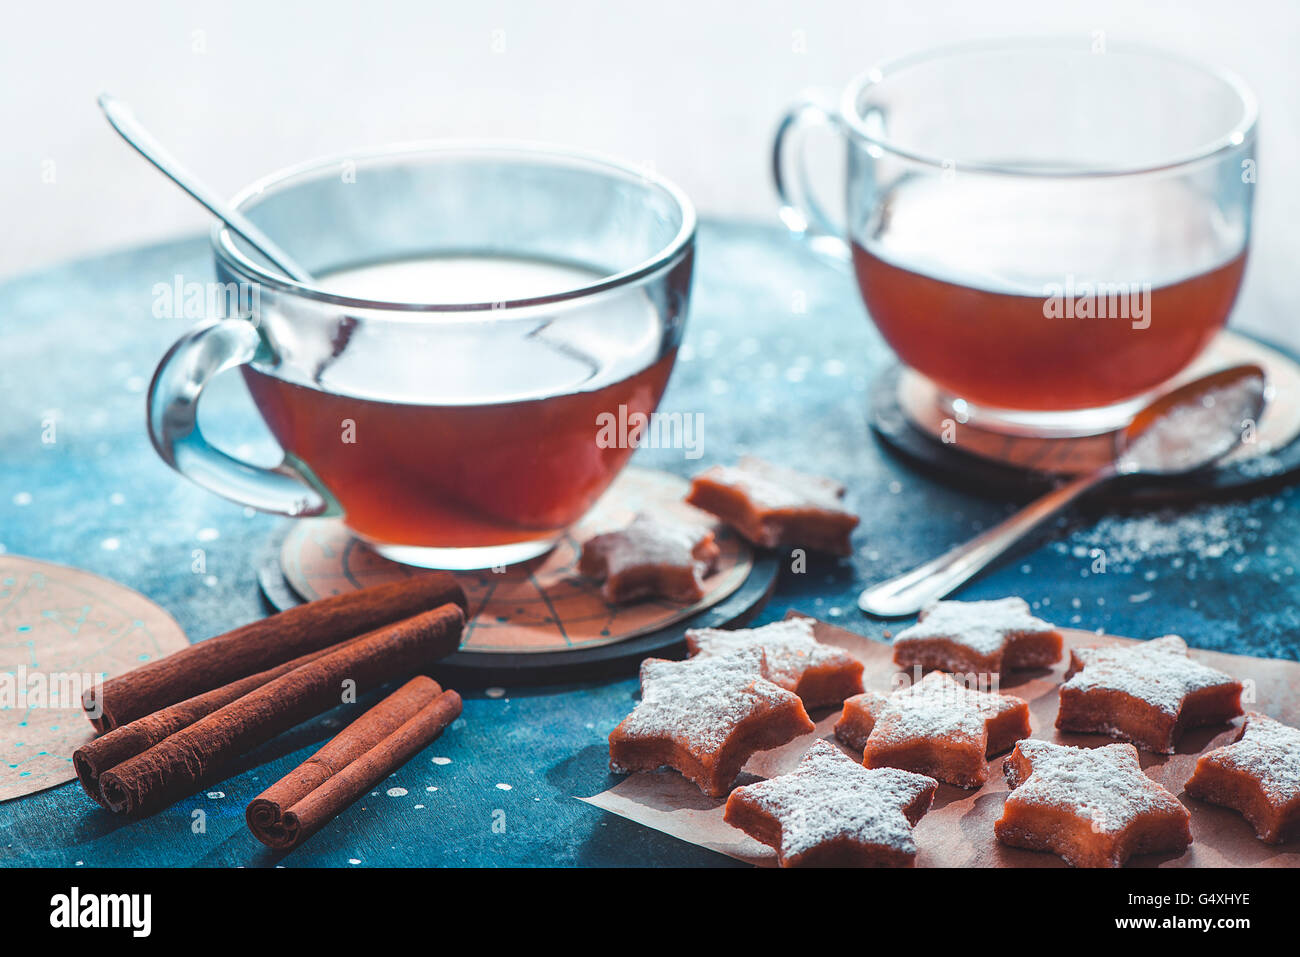 Tea with moonshine and stars - Stock Image